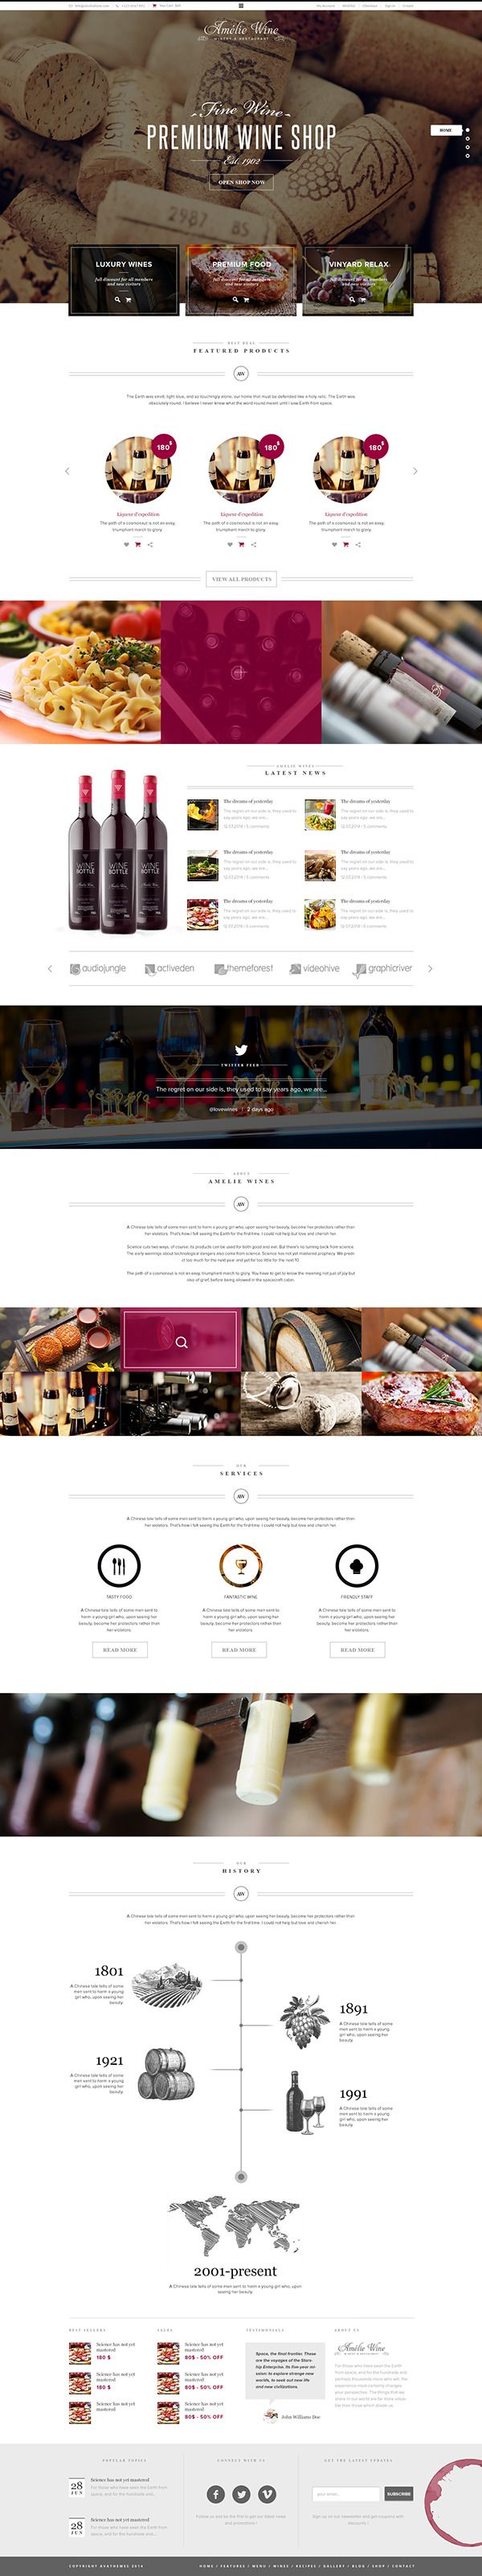 Wine - Responsive Restaurant Winery WordPress Shop by Themes Awards, via Behance